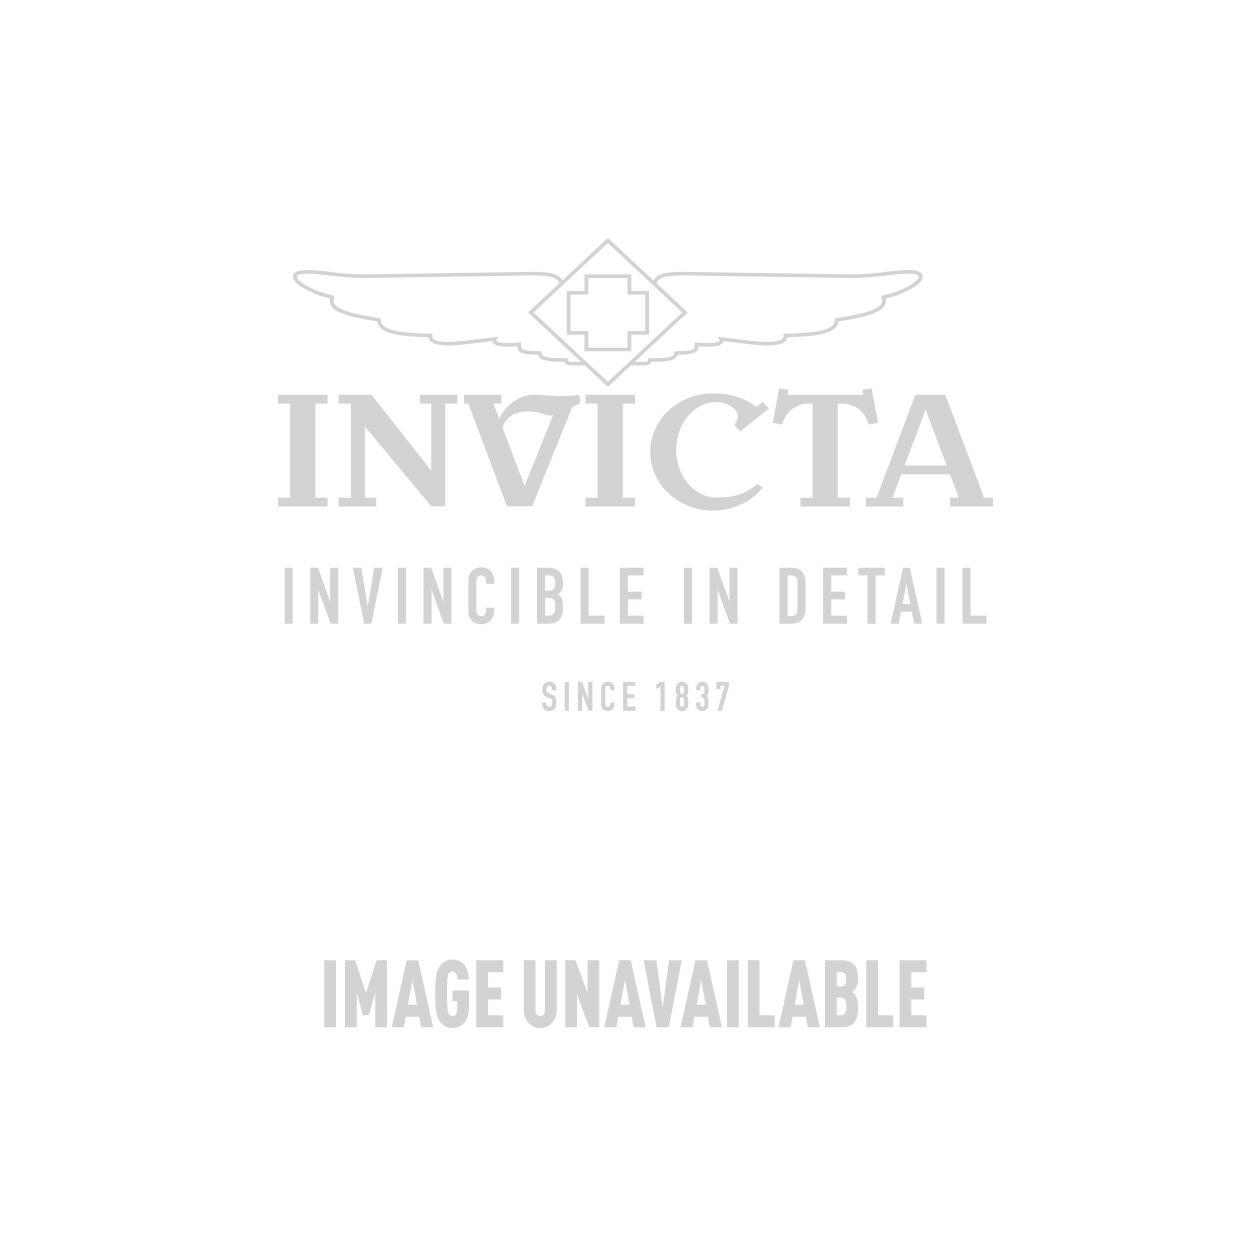 Invicta Corduba Swiss Movement Quartz Watch - Stainless Steel case with Steel, Black tone Stainless Steel, Polyurethane band - Model 10604